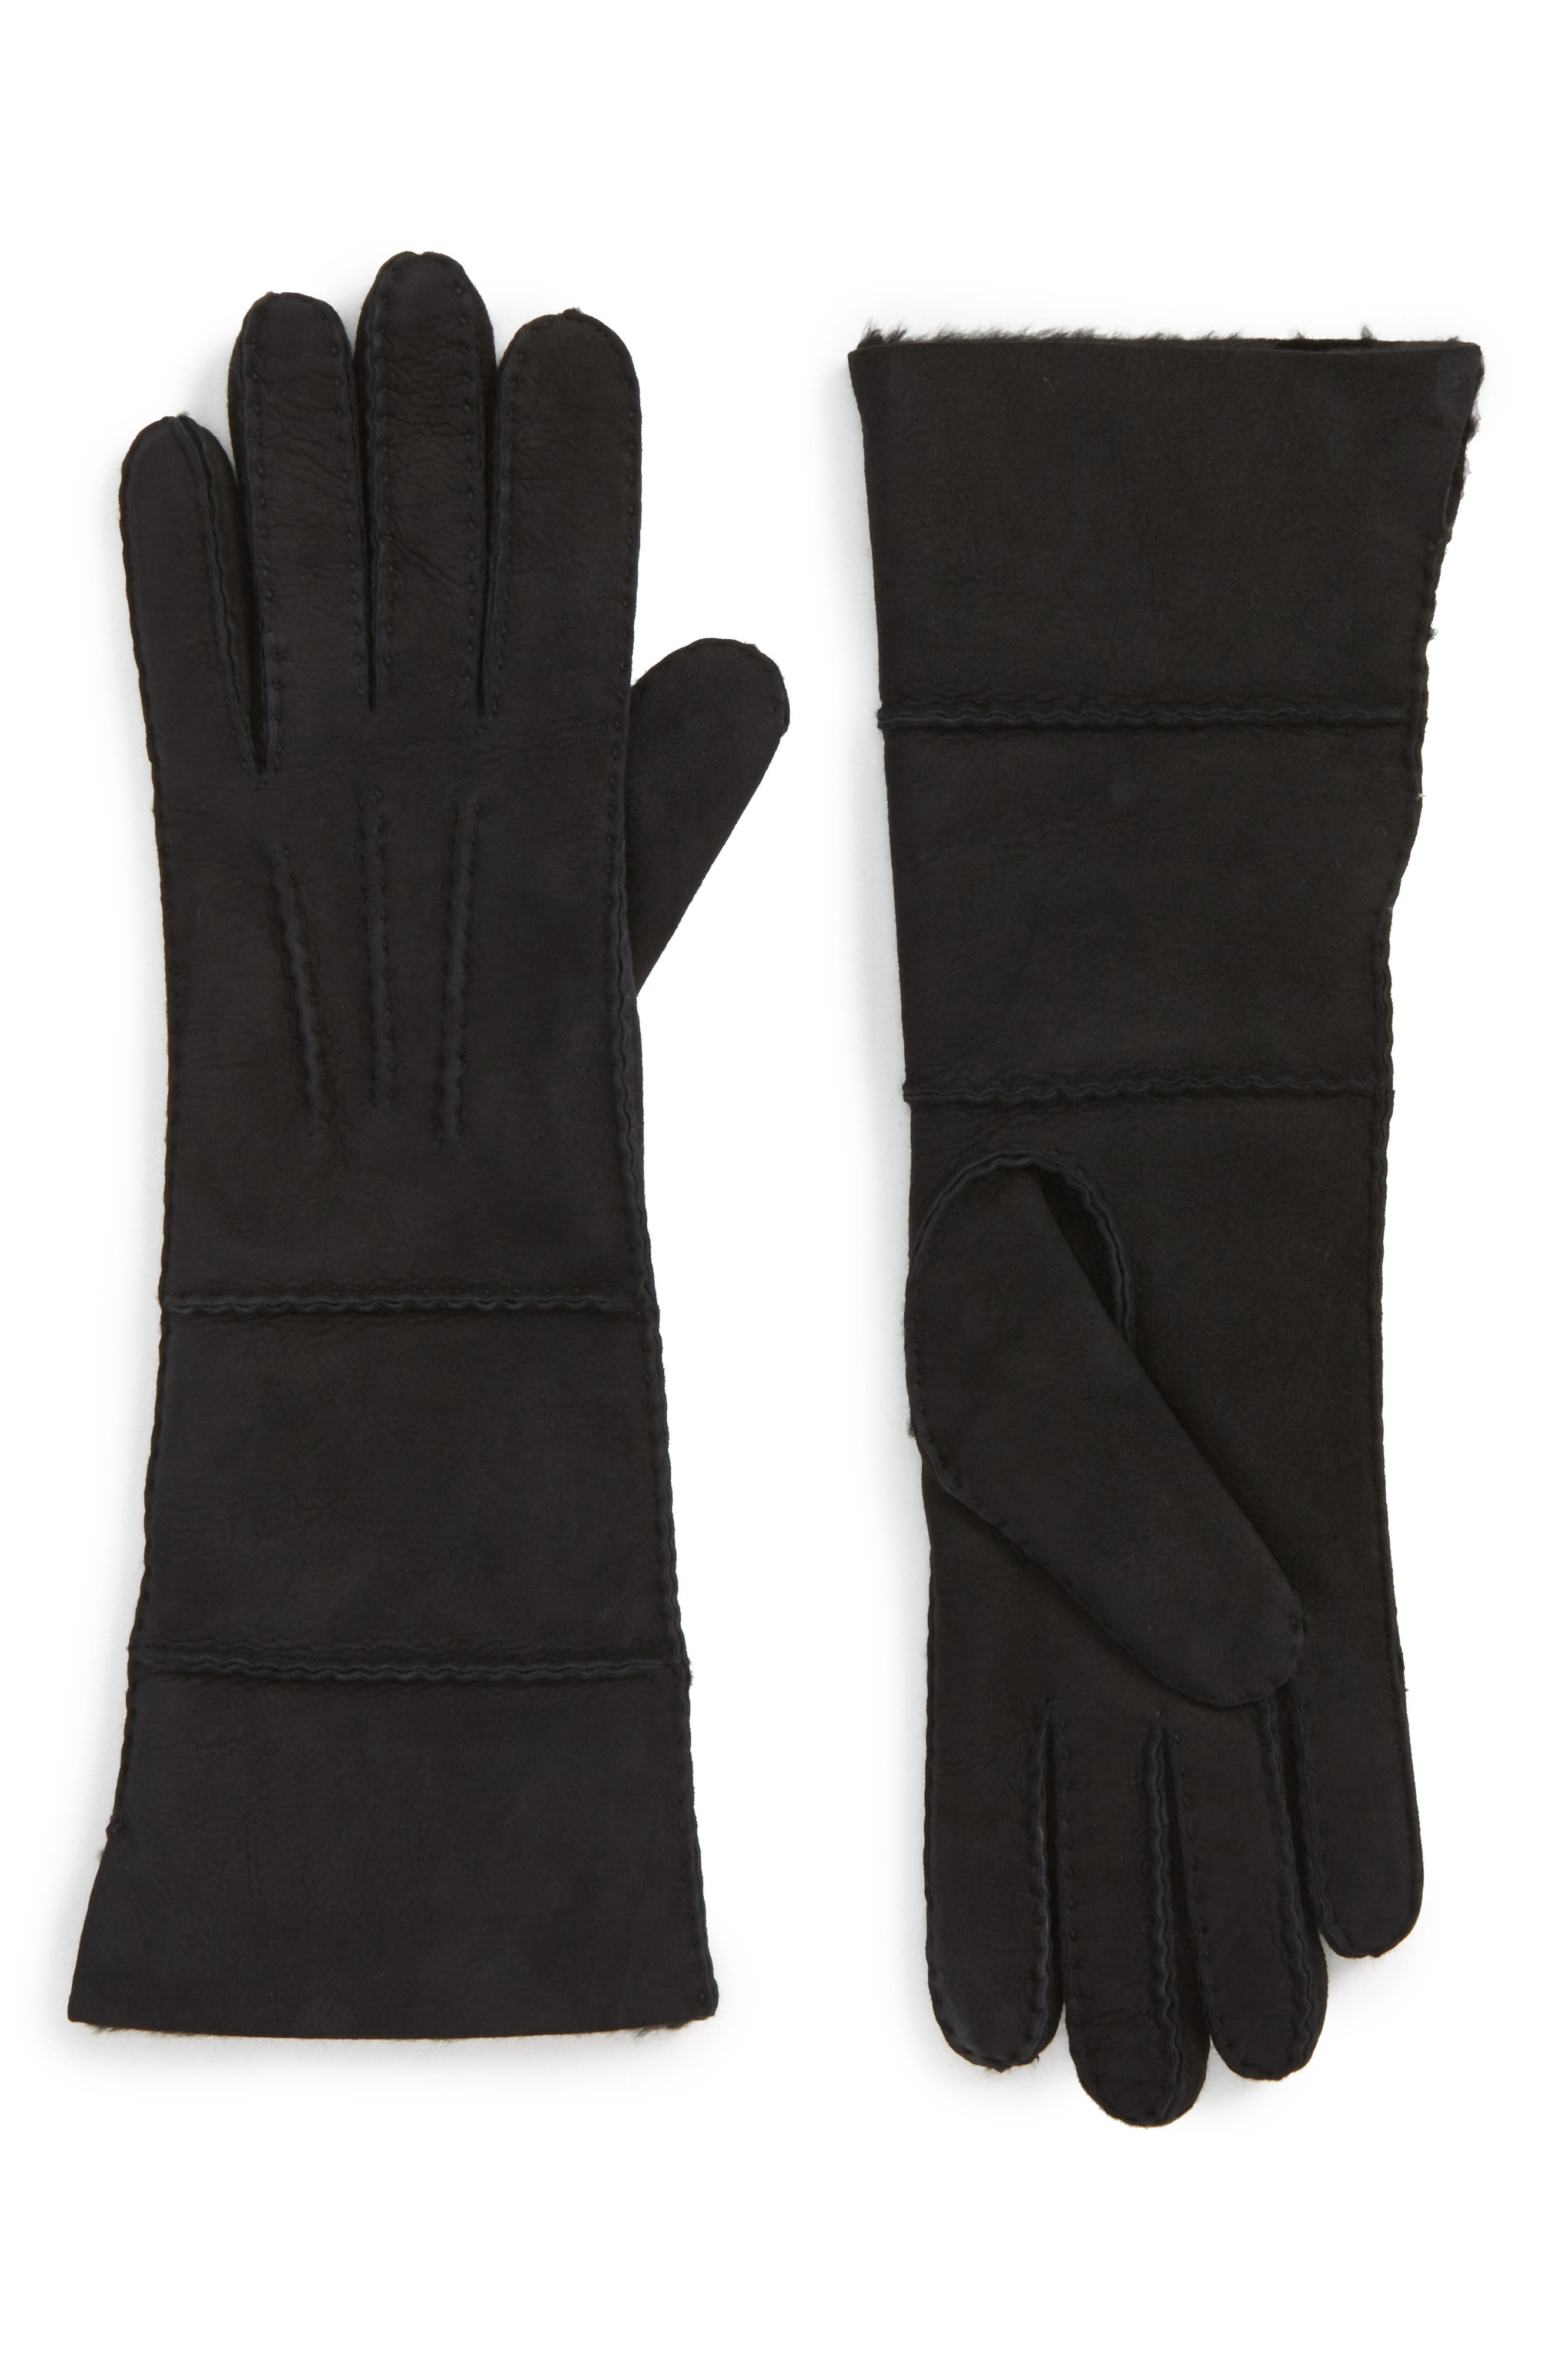 UGG<sup>®</sup> Long Slim Genuine Shearling Gloves,                         Main,                         color,